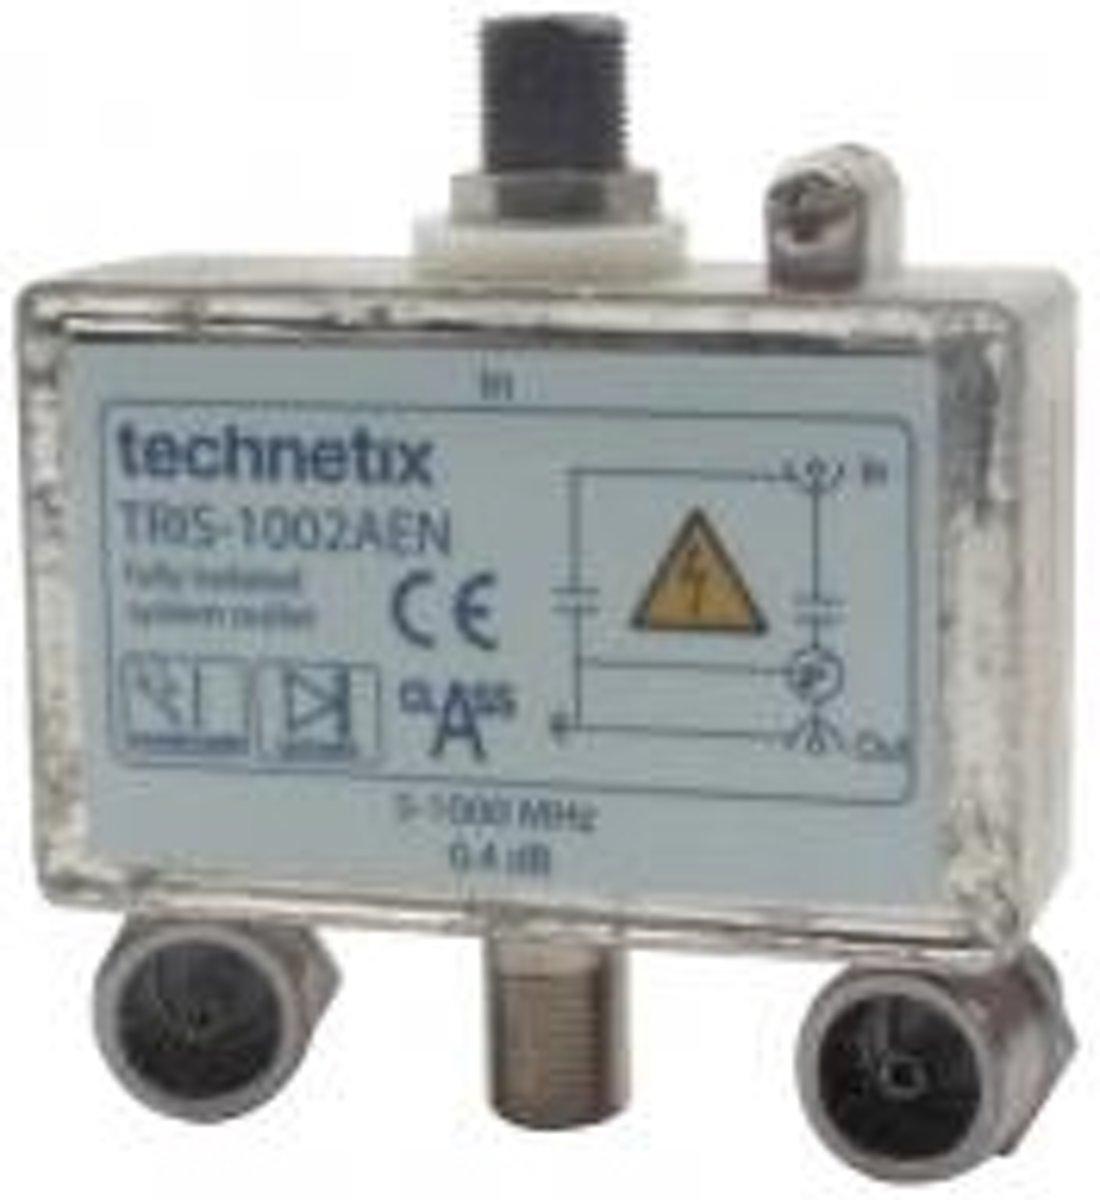 Technetix TRIS-1002AEN kopen